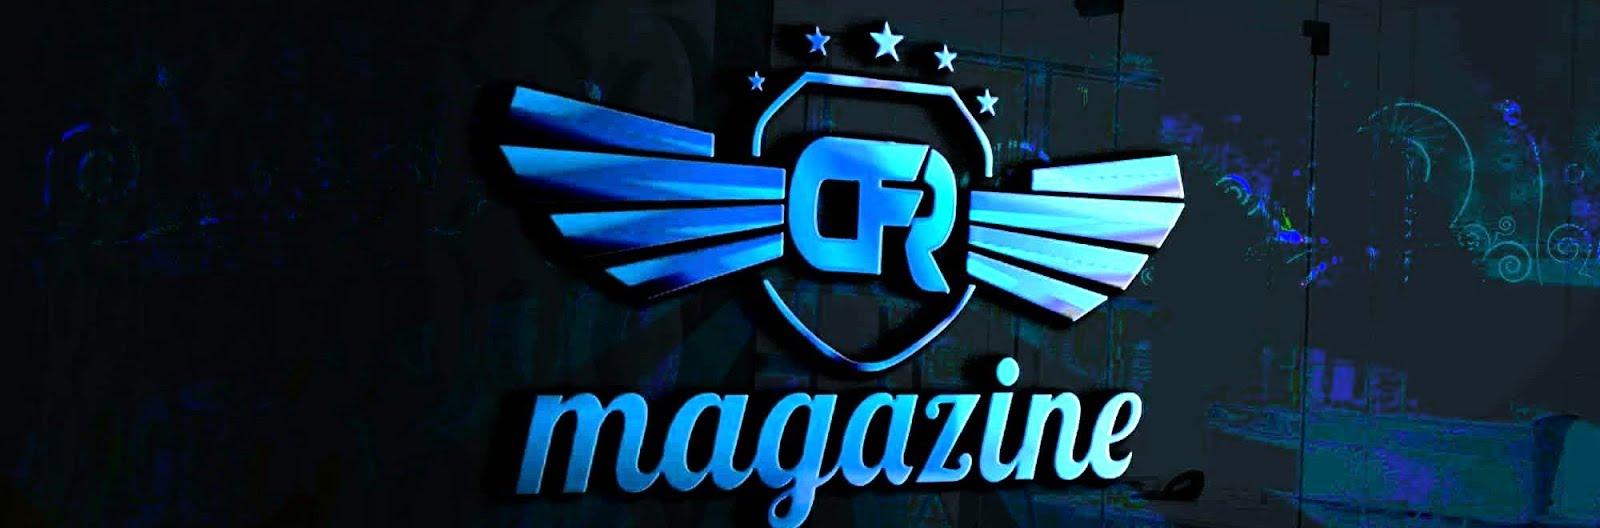 cfr magazine